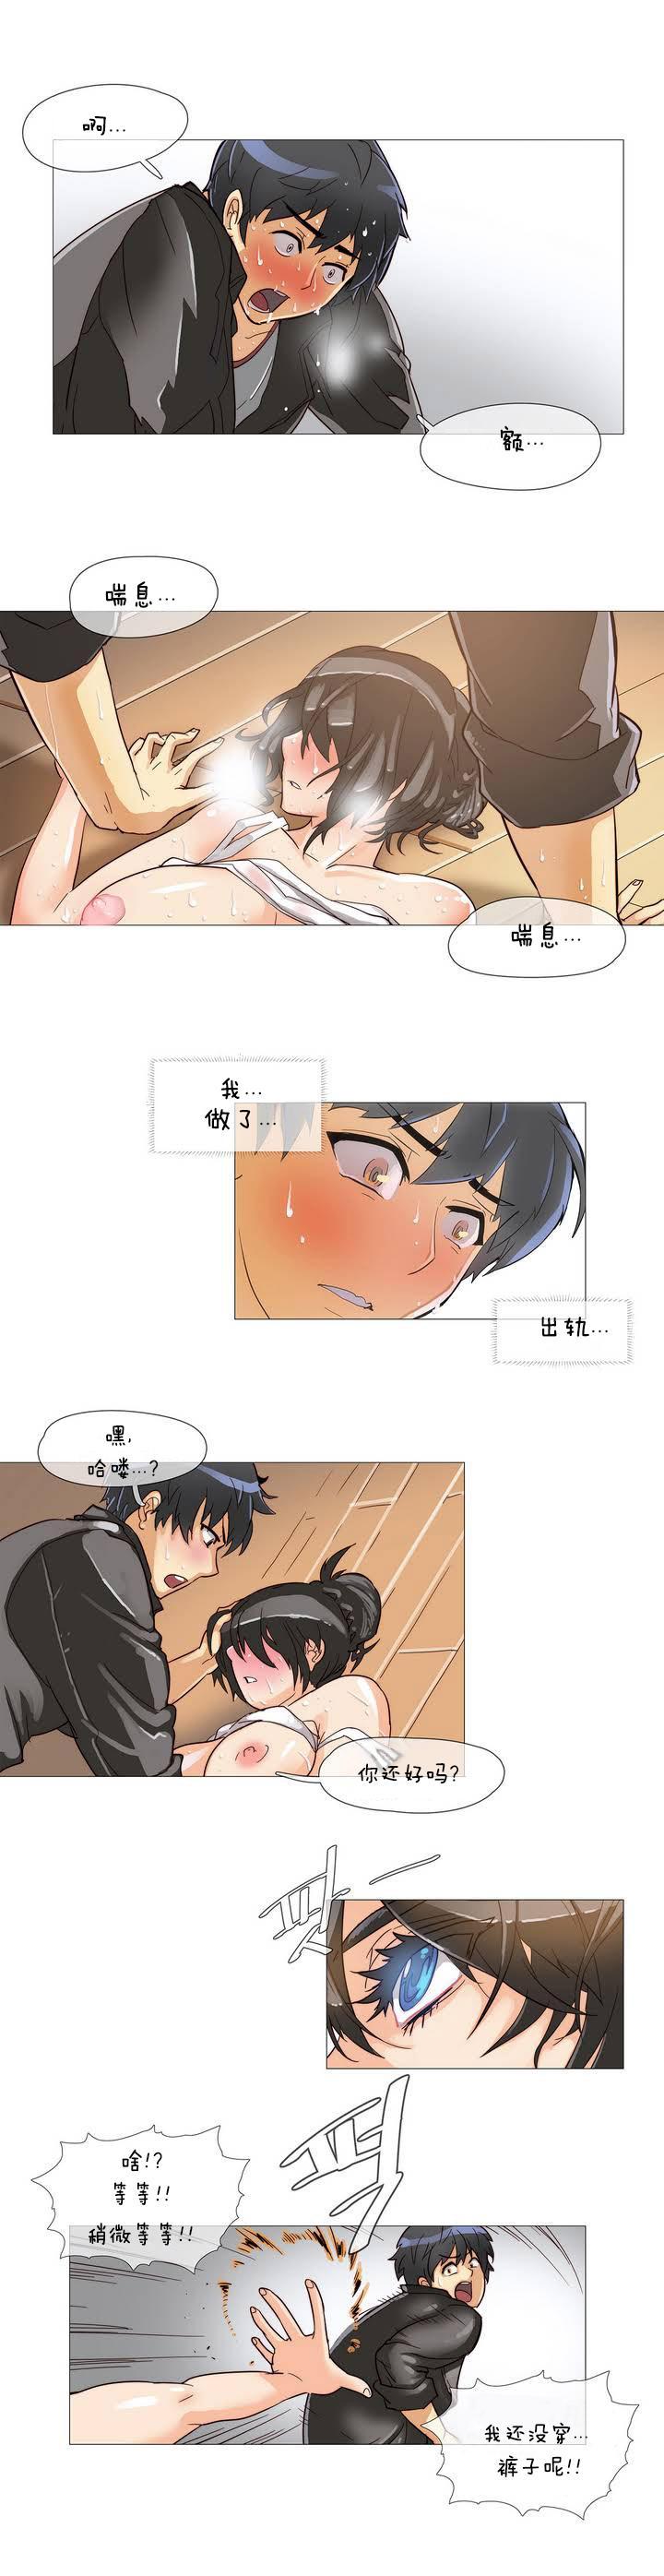 HouseHold Affairs 【卞赤鲤个人汉化】1~21话(持续更新中) 7